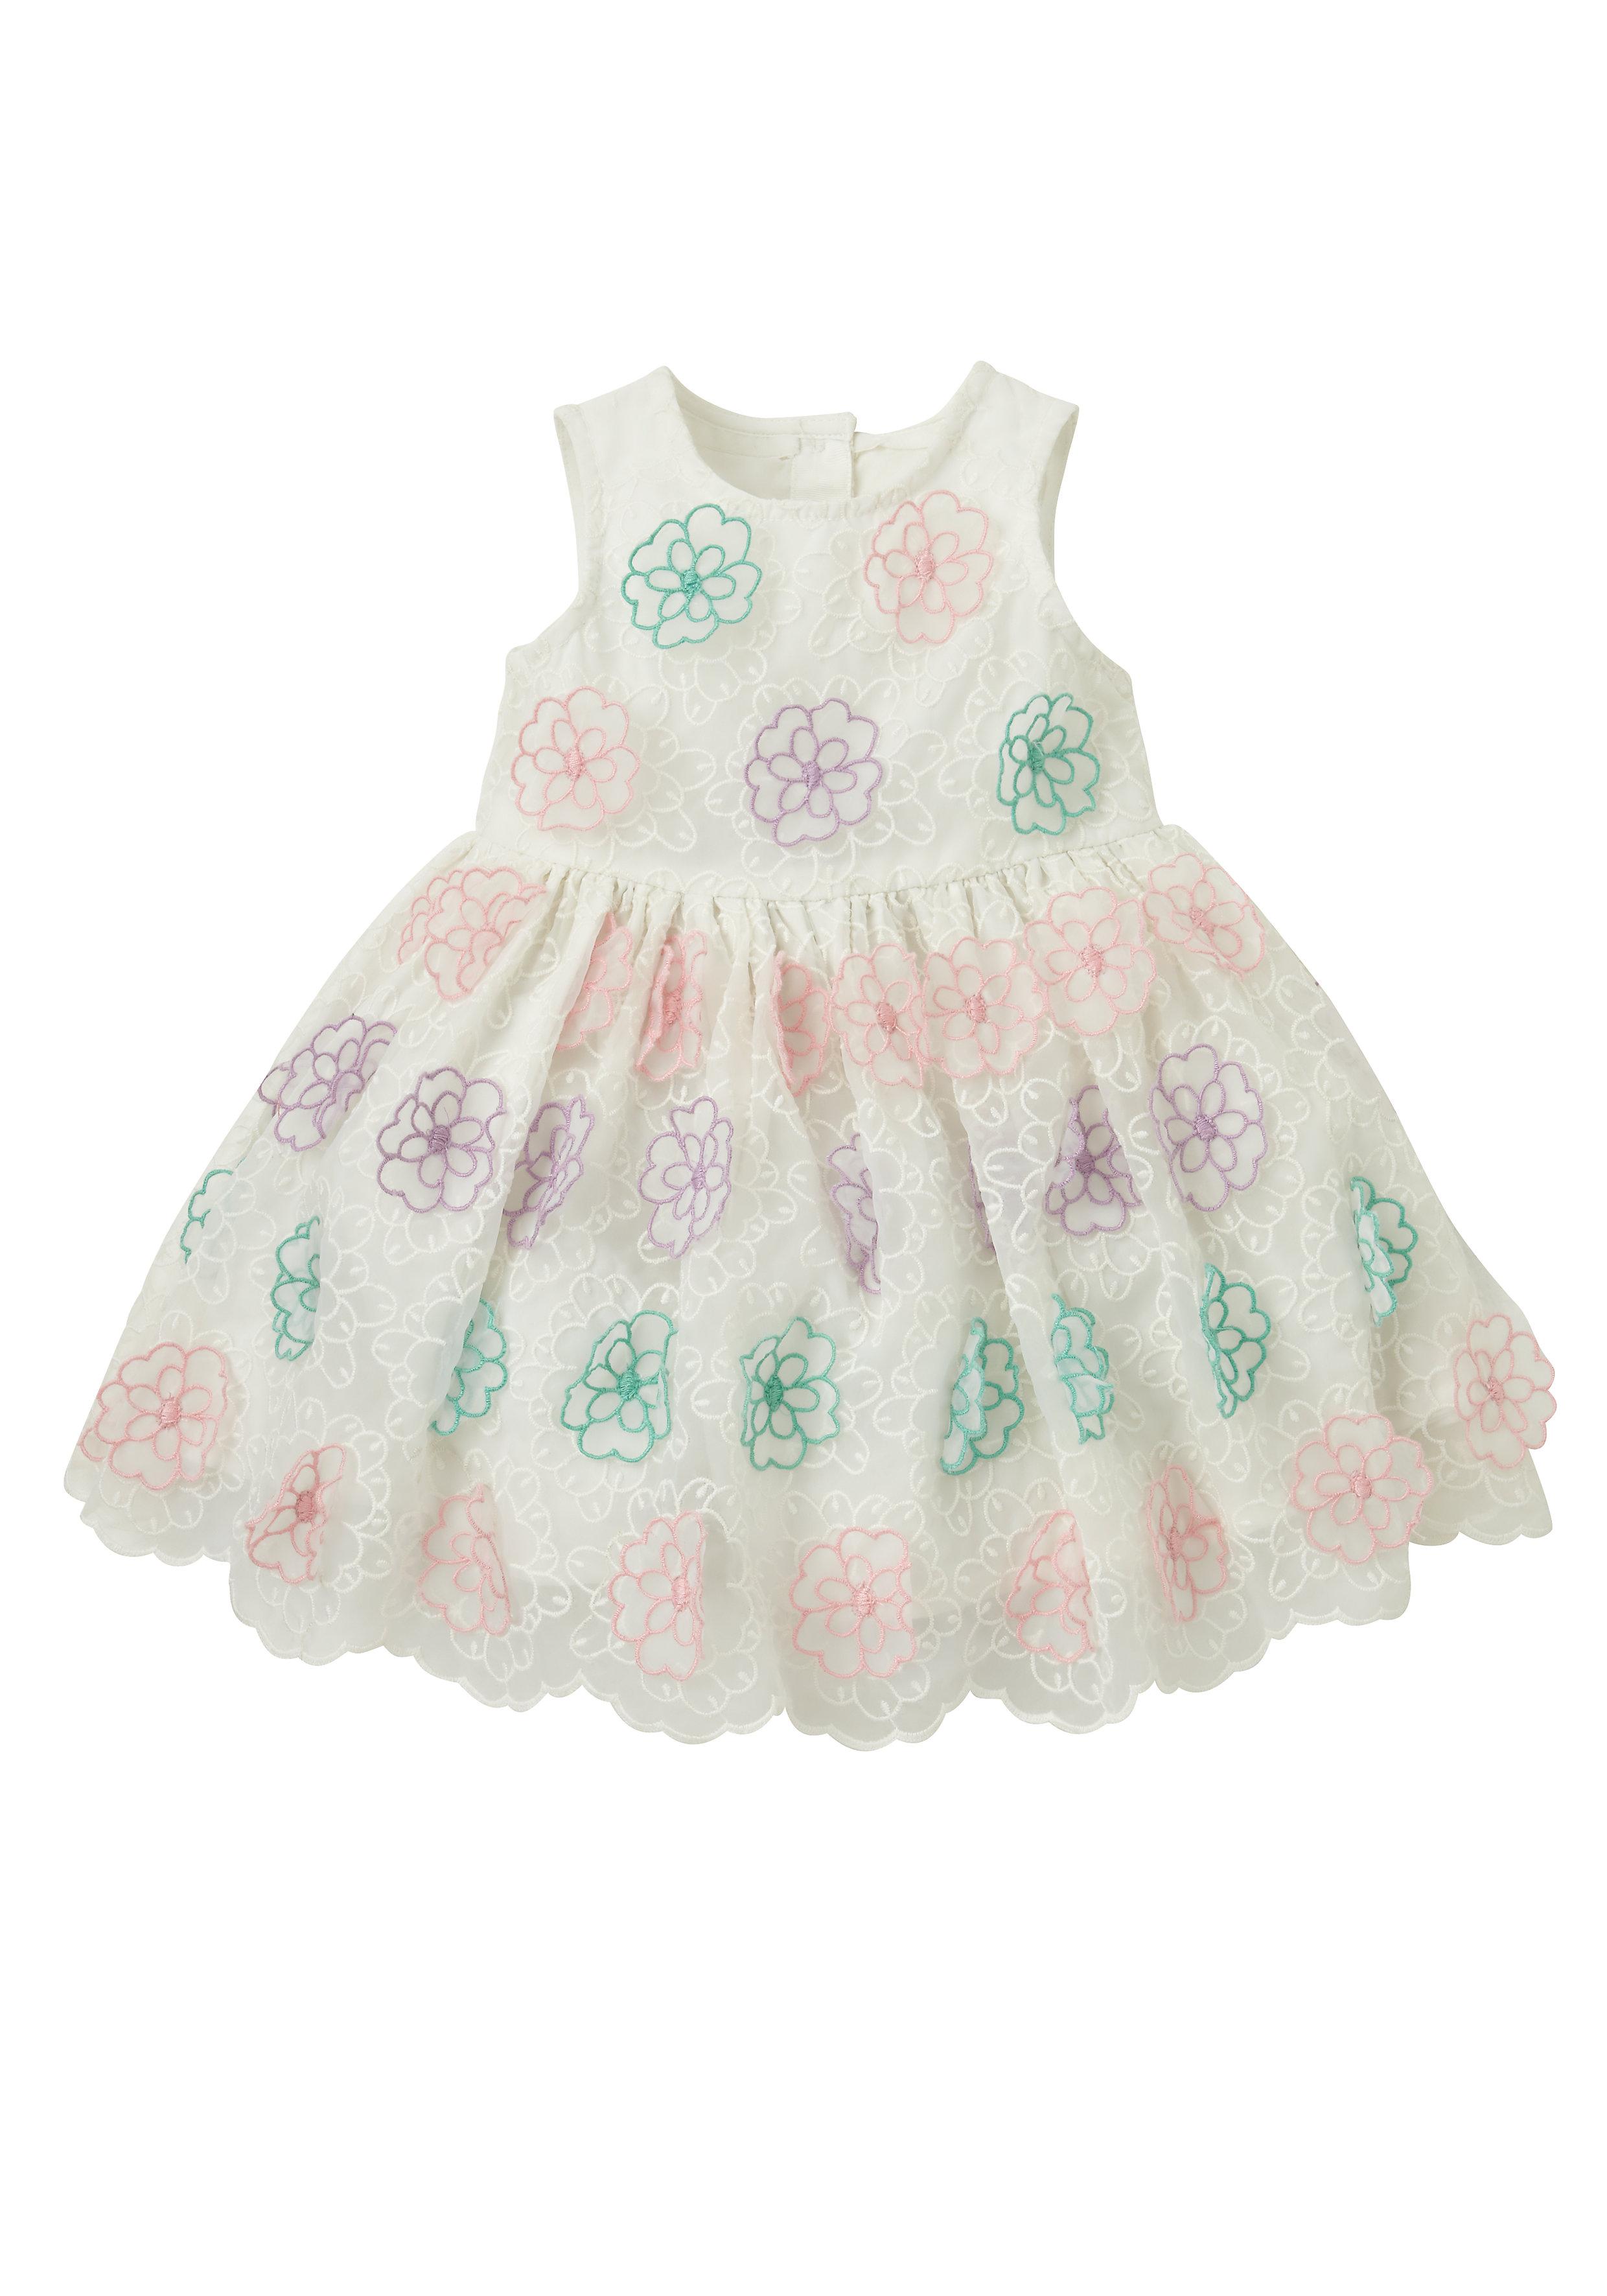 Mothercare | Girls Sleeveless Dress Flower Embroidery - Cream